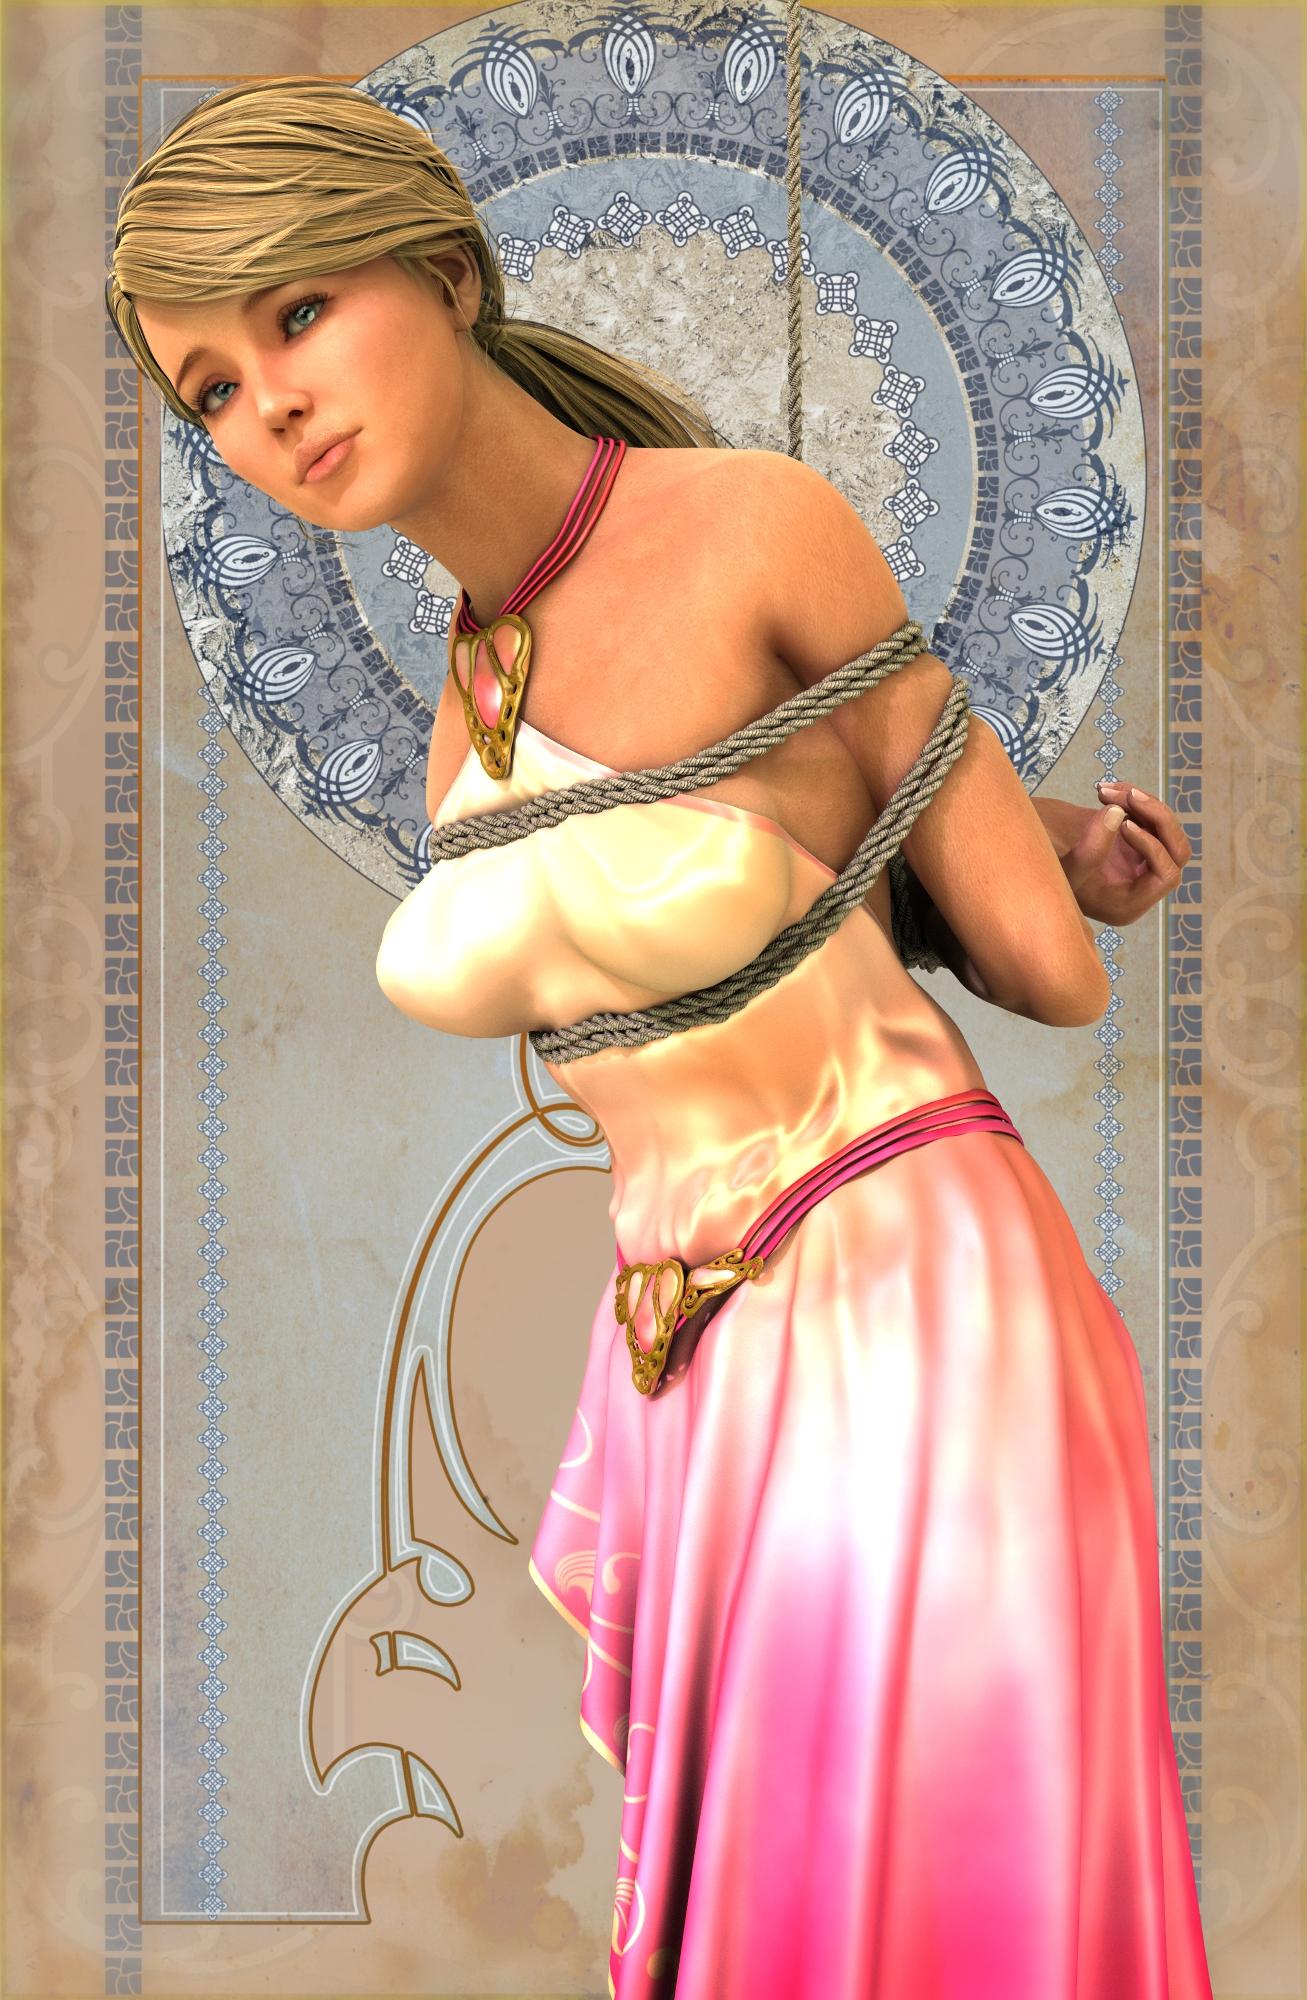 3d princess sacrificed to the troll god and more - 3 4